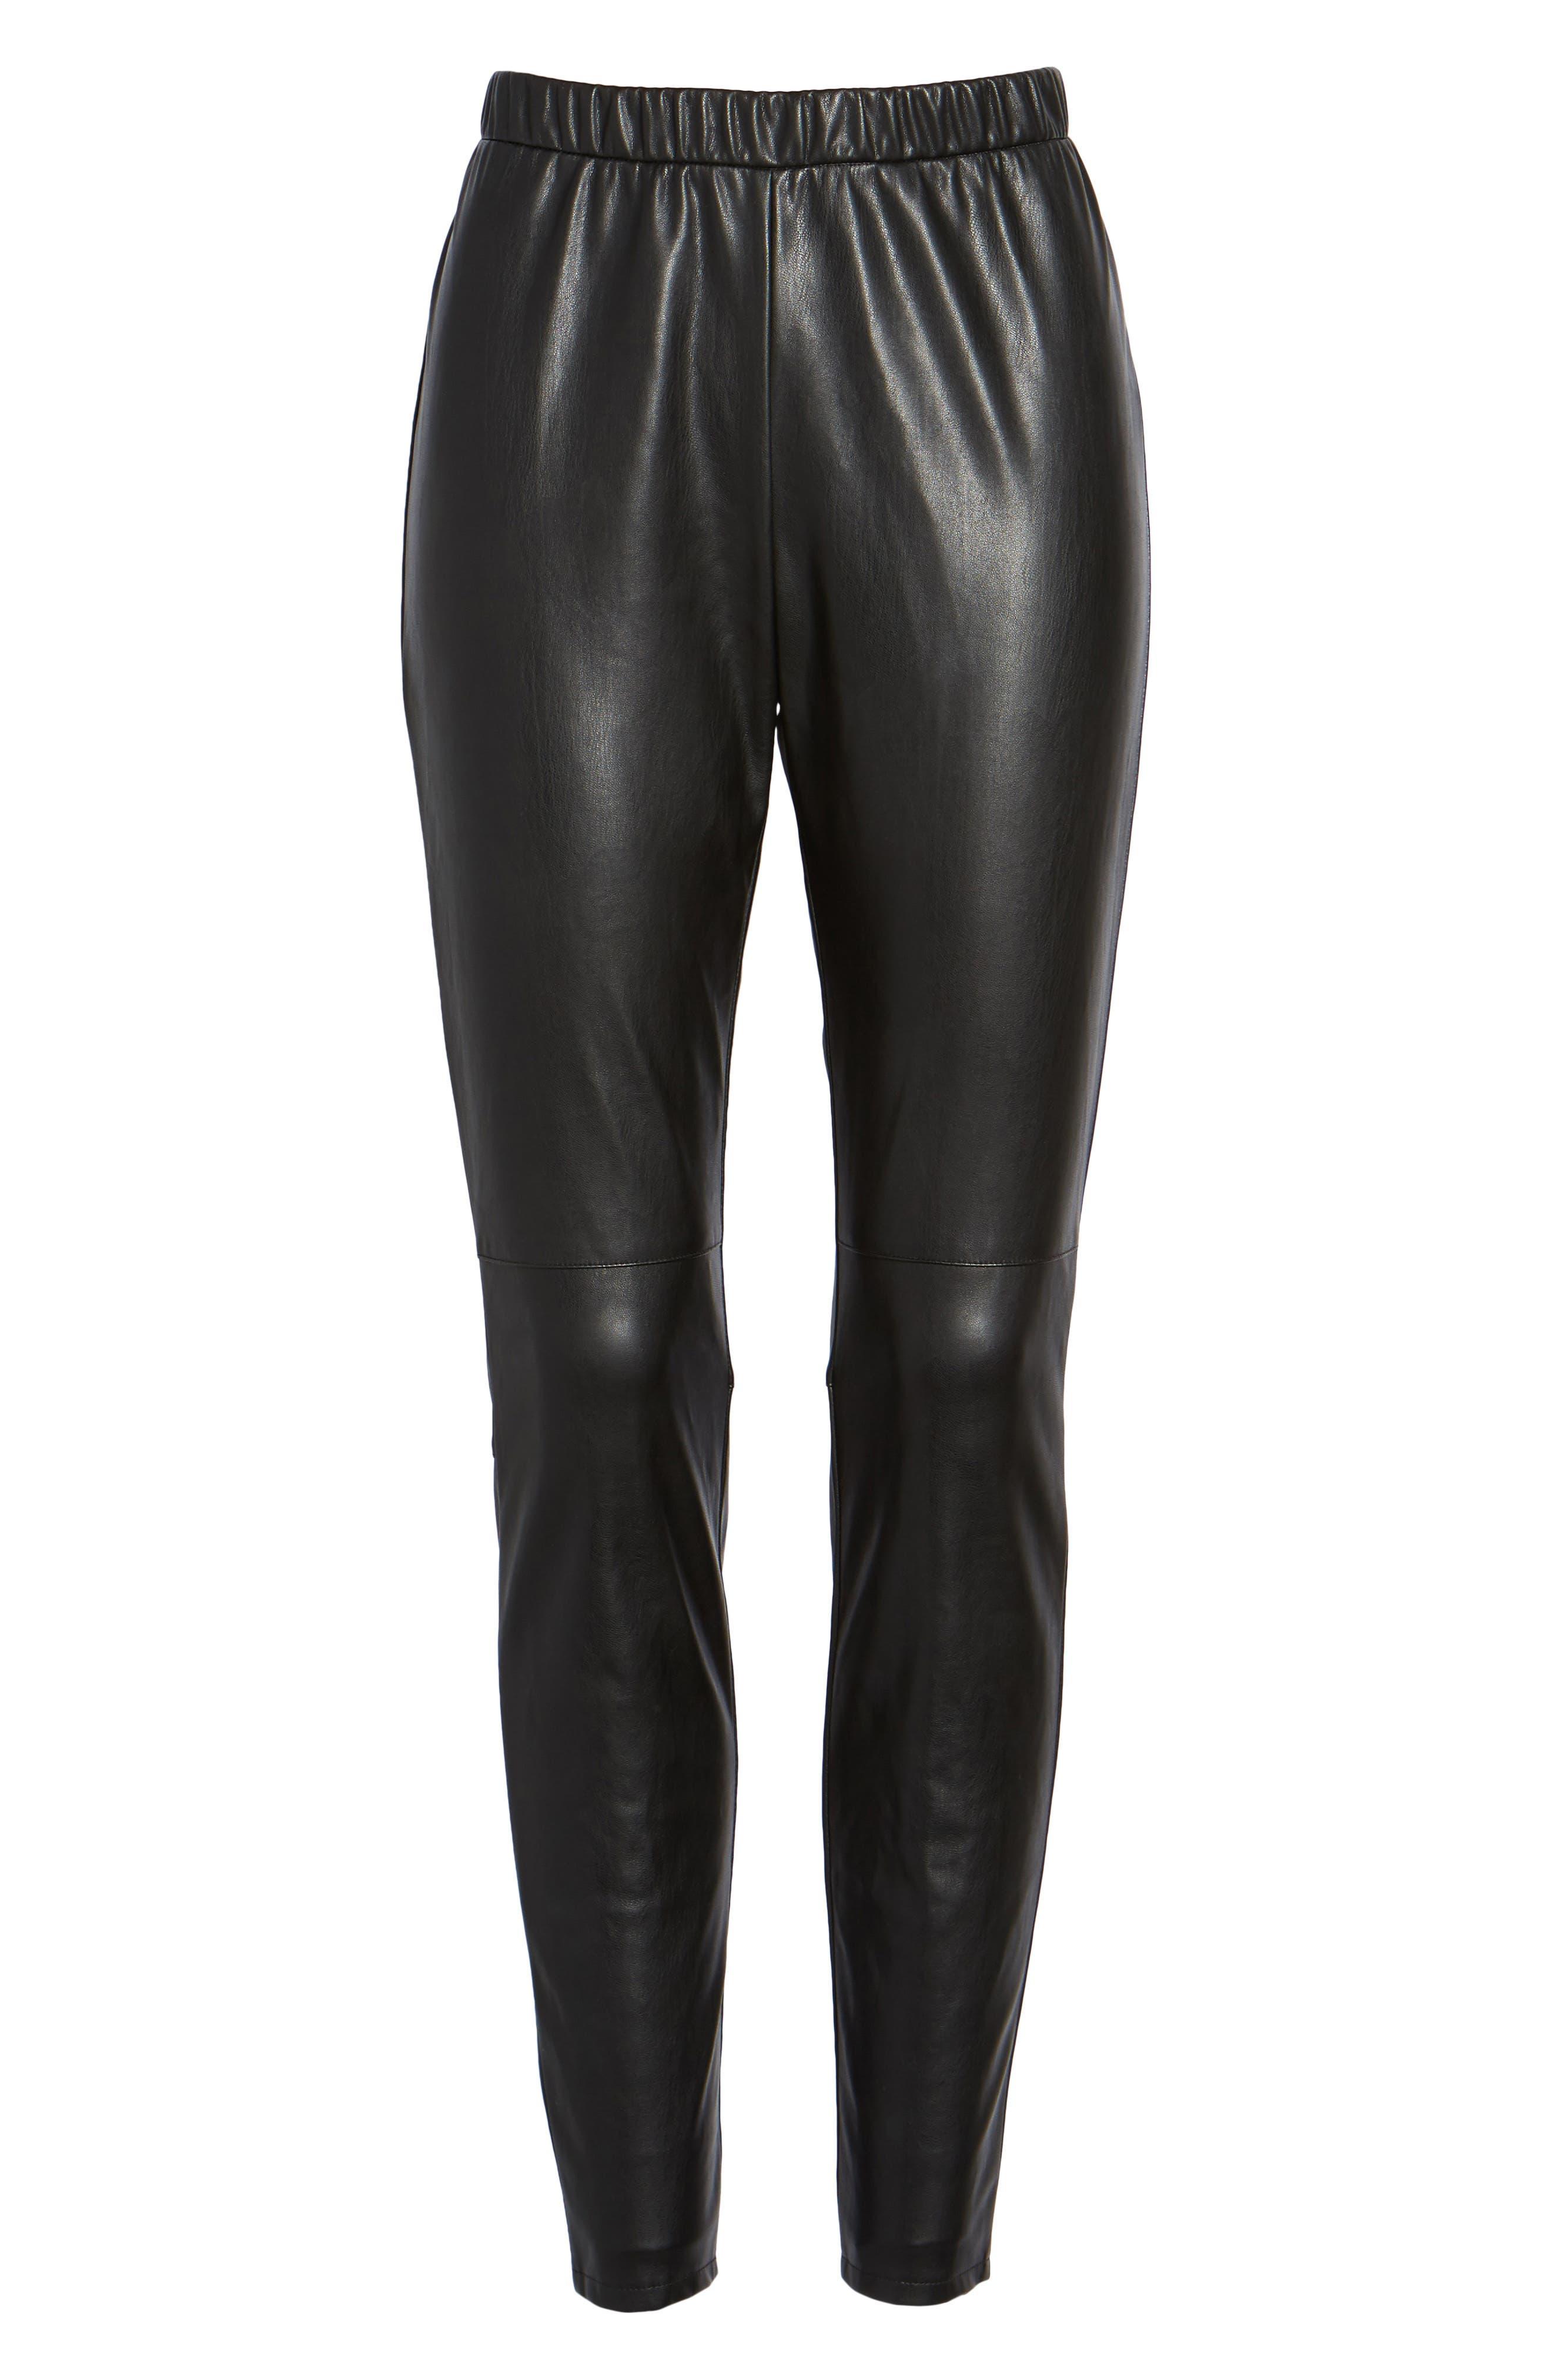 Zowie Faux Leather Pants,                             Alternate thumbnail 6, color,                             001